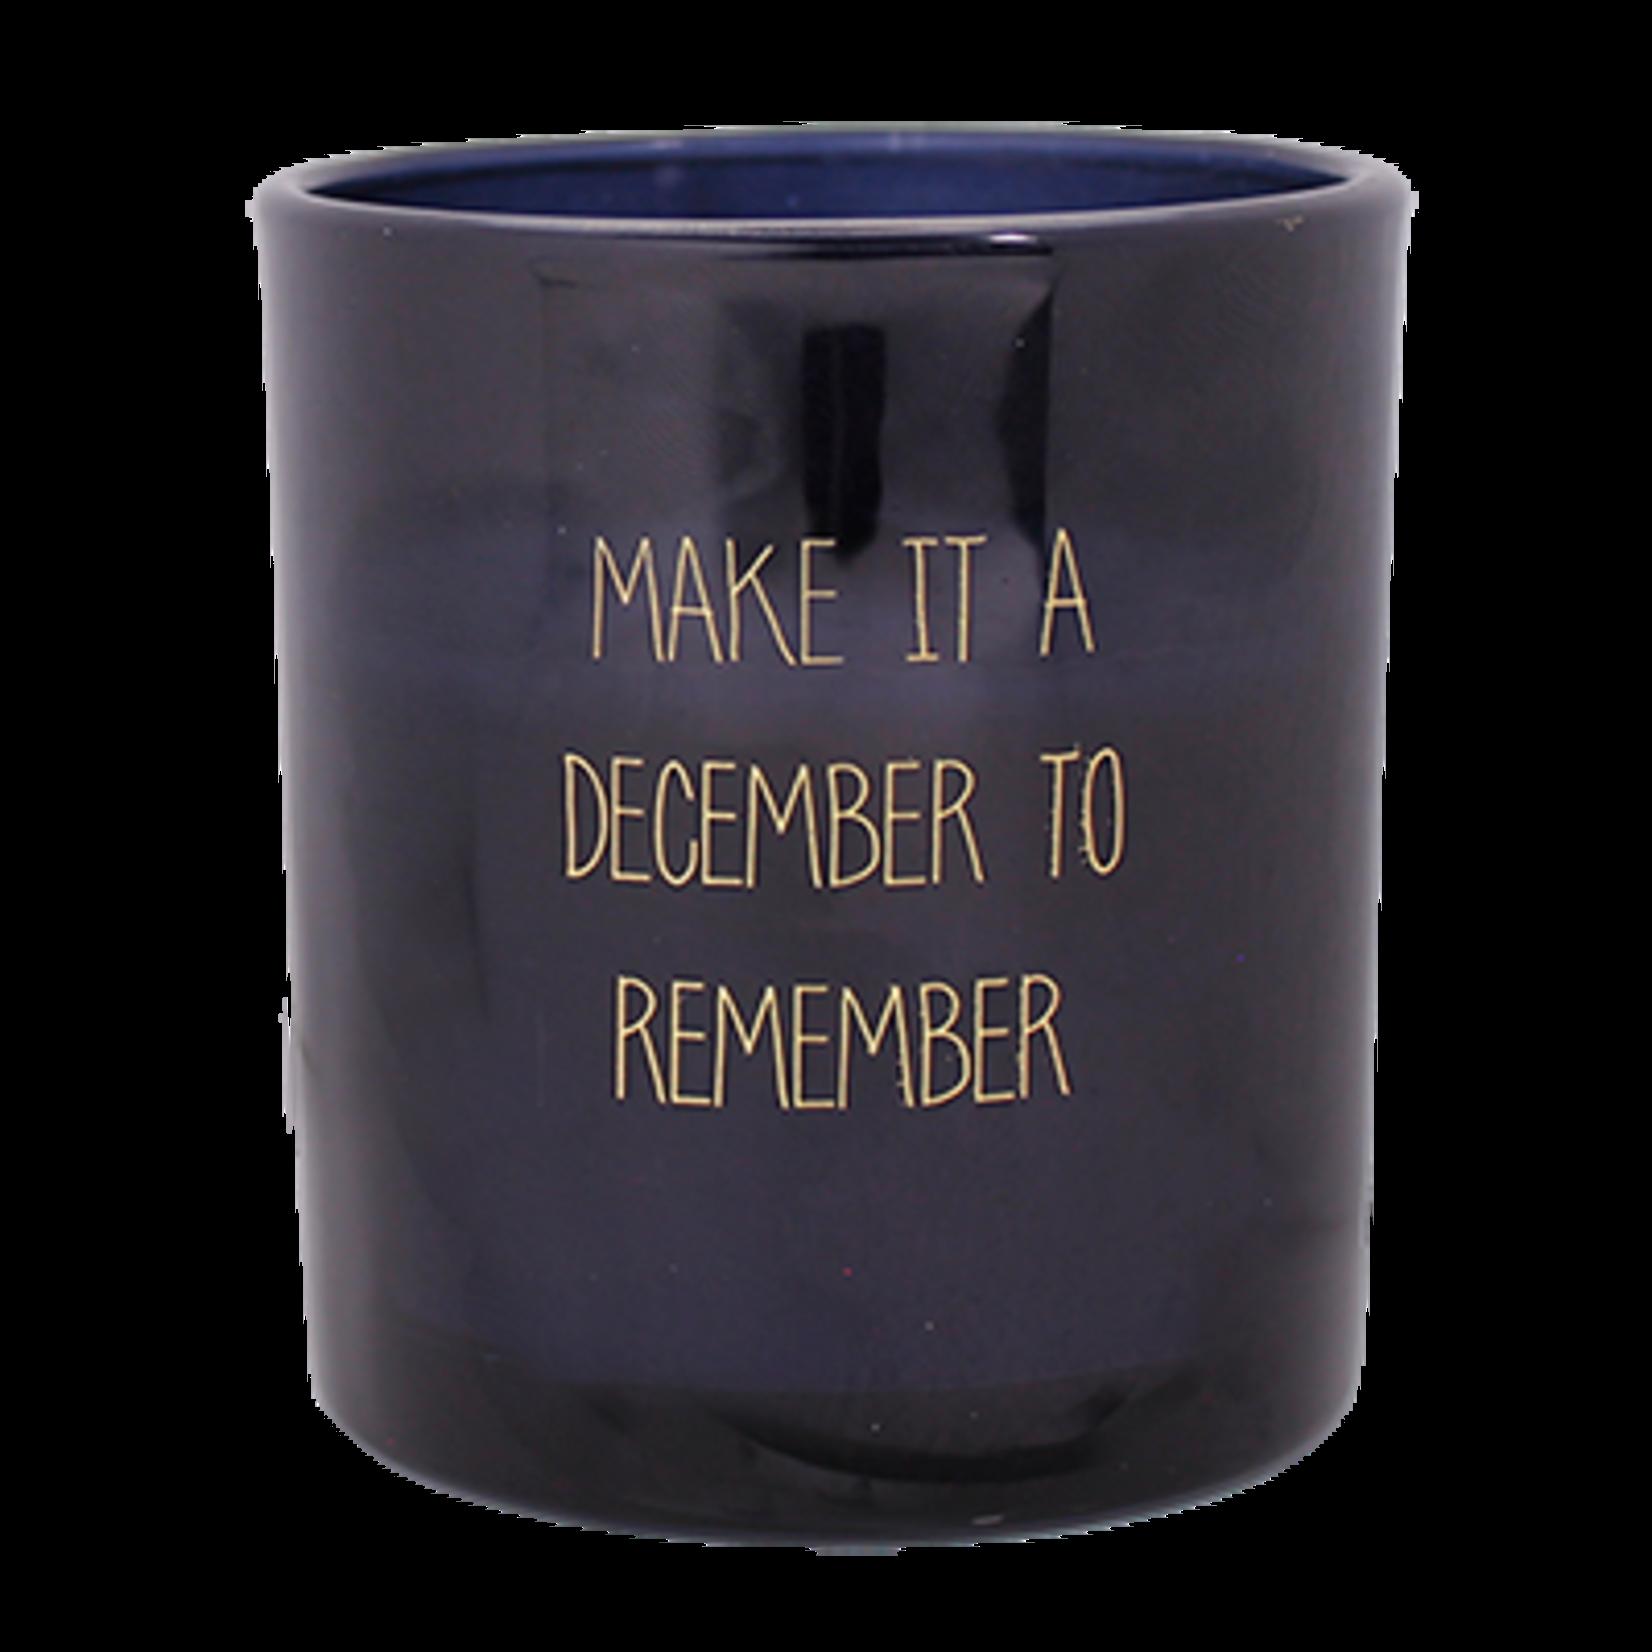 My Flame Sojakaars - Make it a december to remember - Zwart